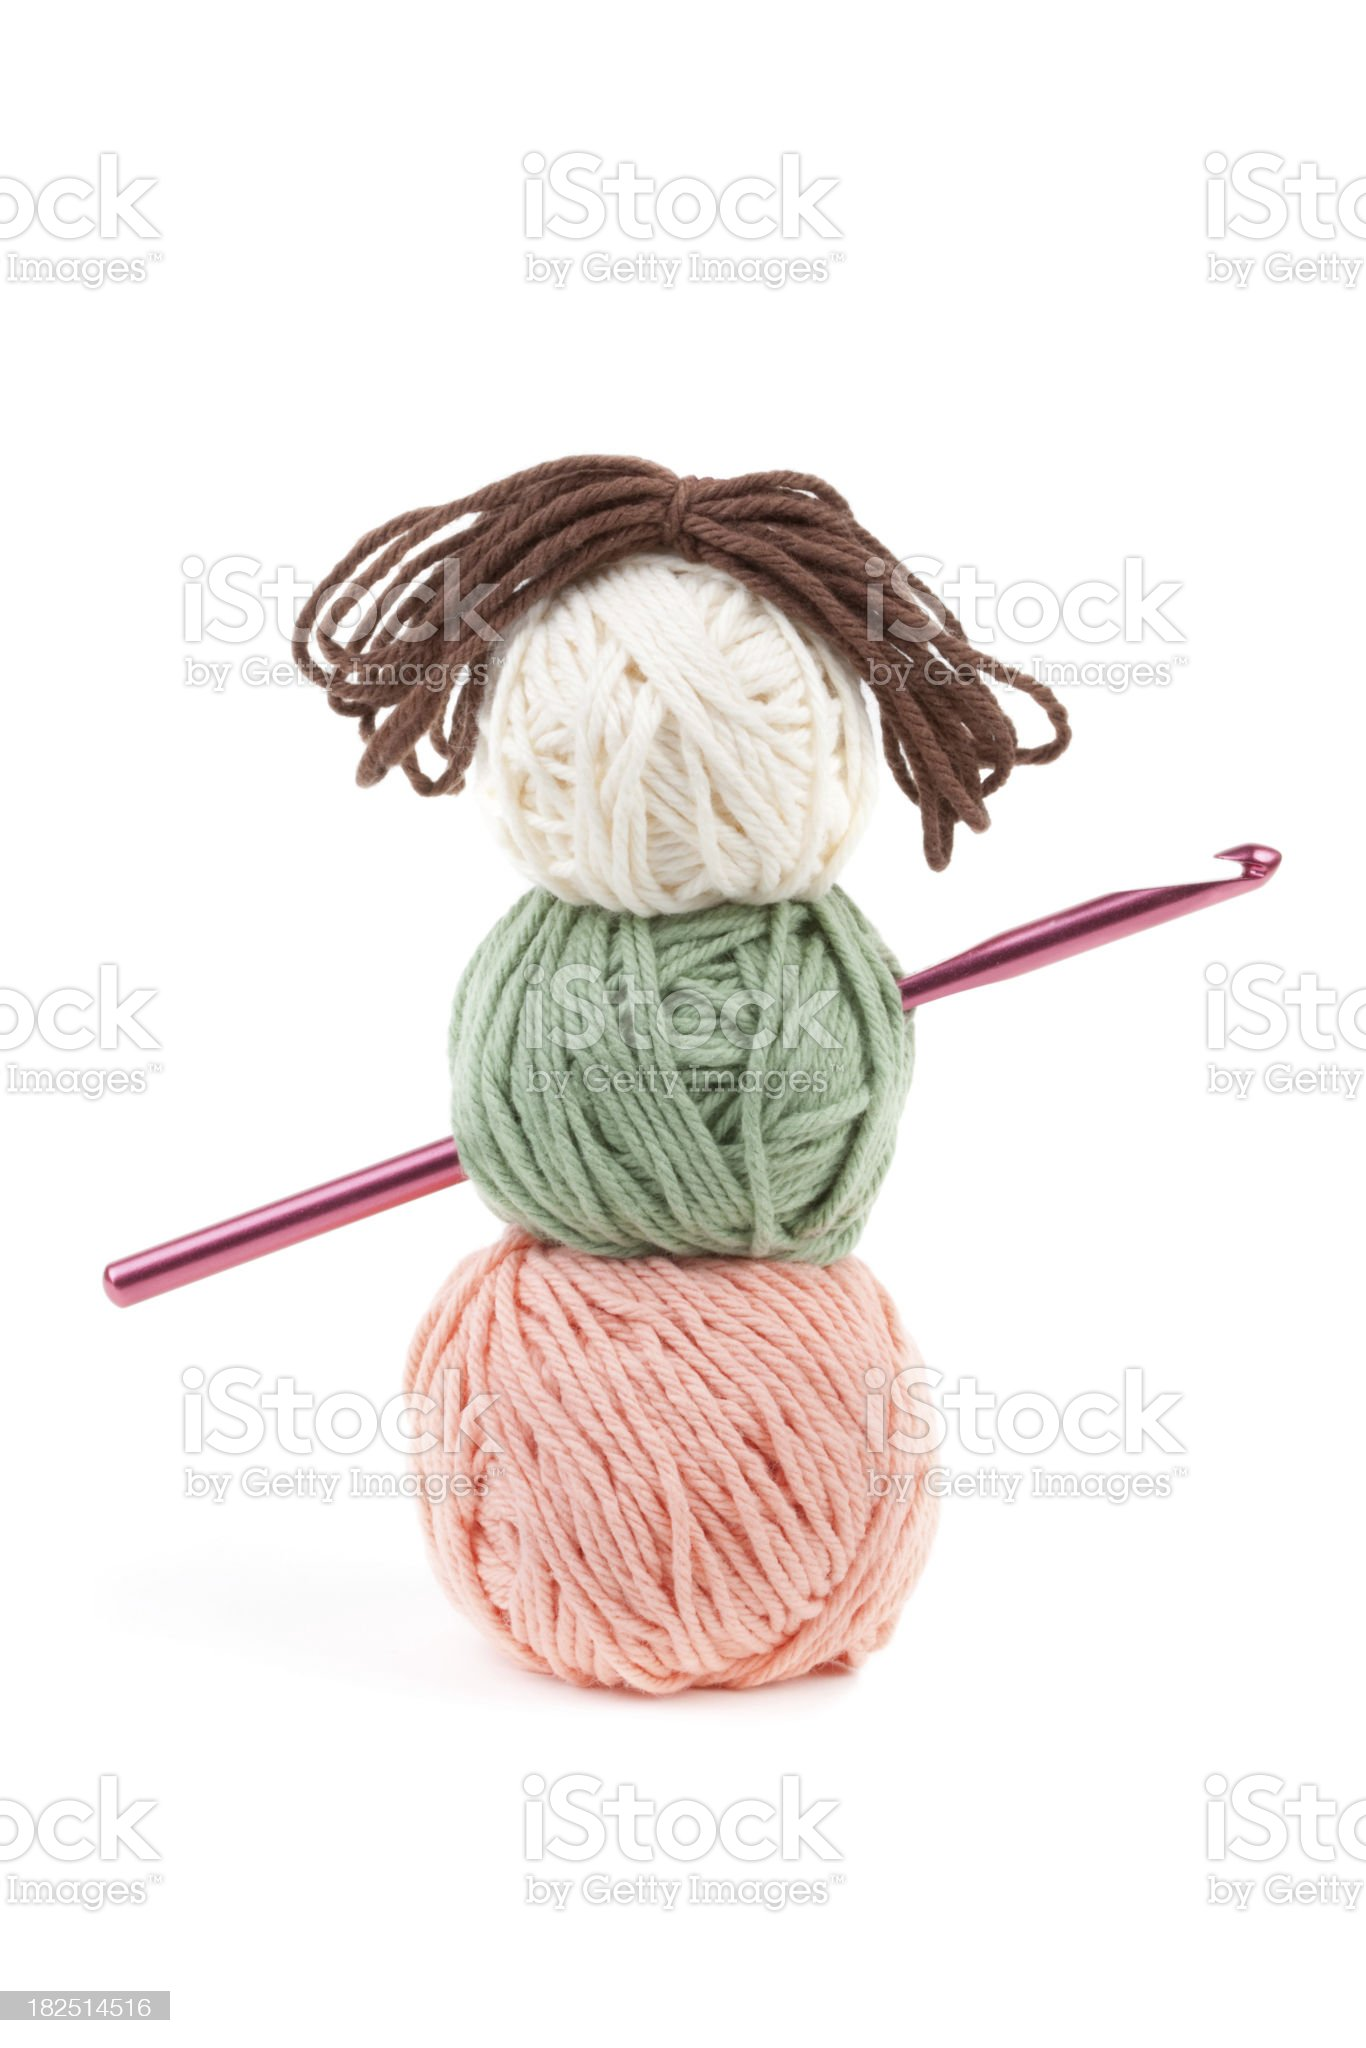 Craft Yarn Doll royalty-free stock photo